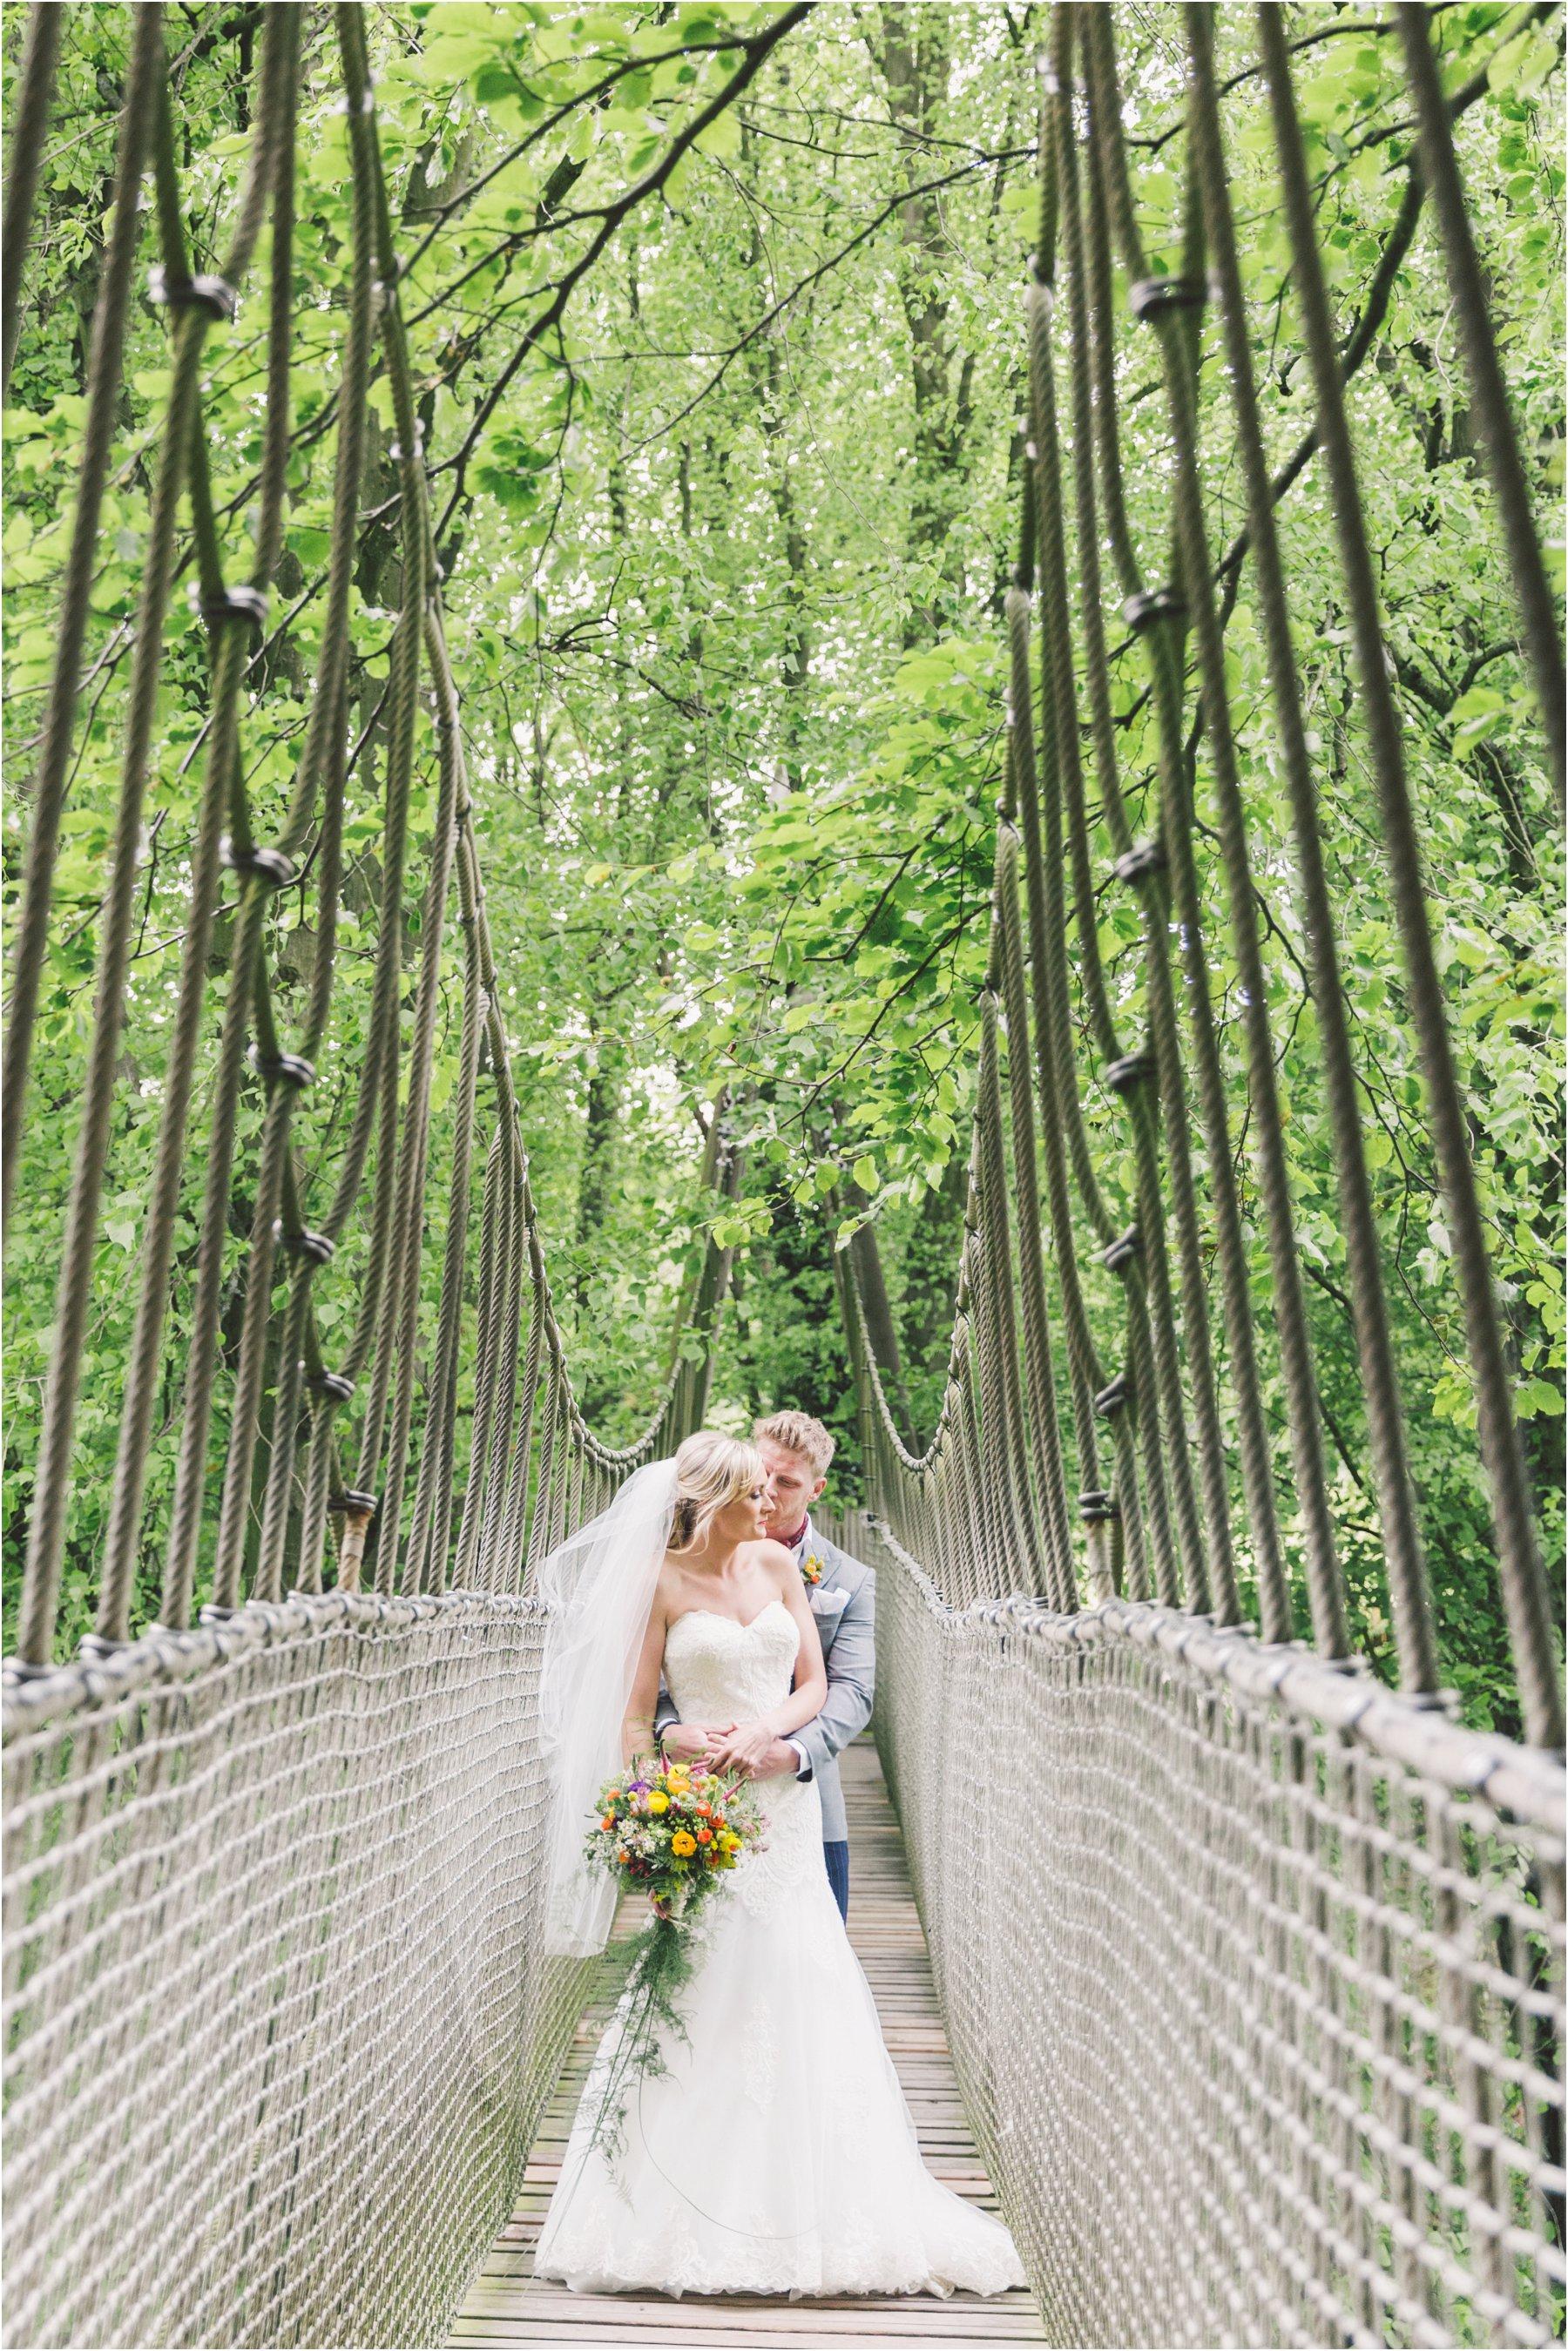 eve.photography.relaxed.creative.wedding.destination._0281.jpg